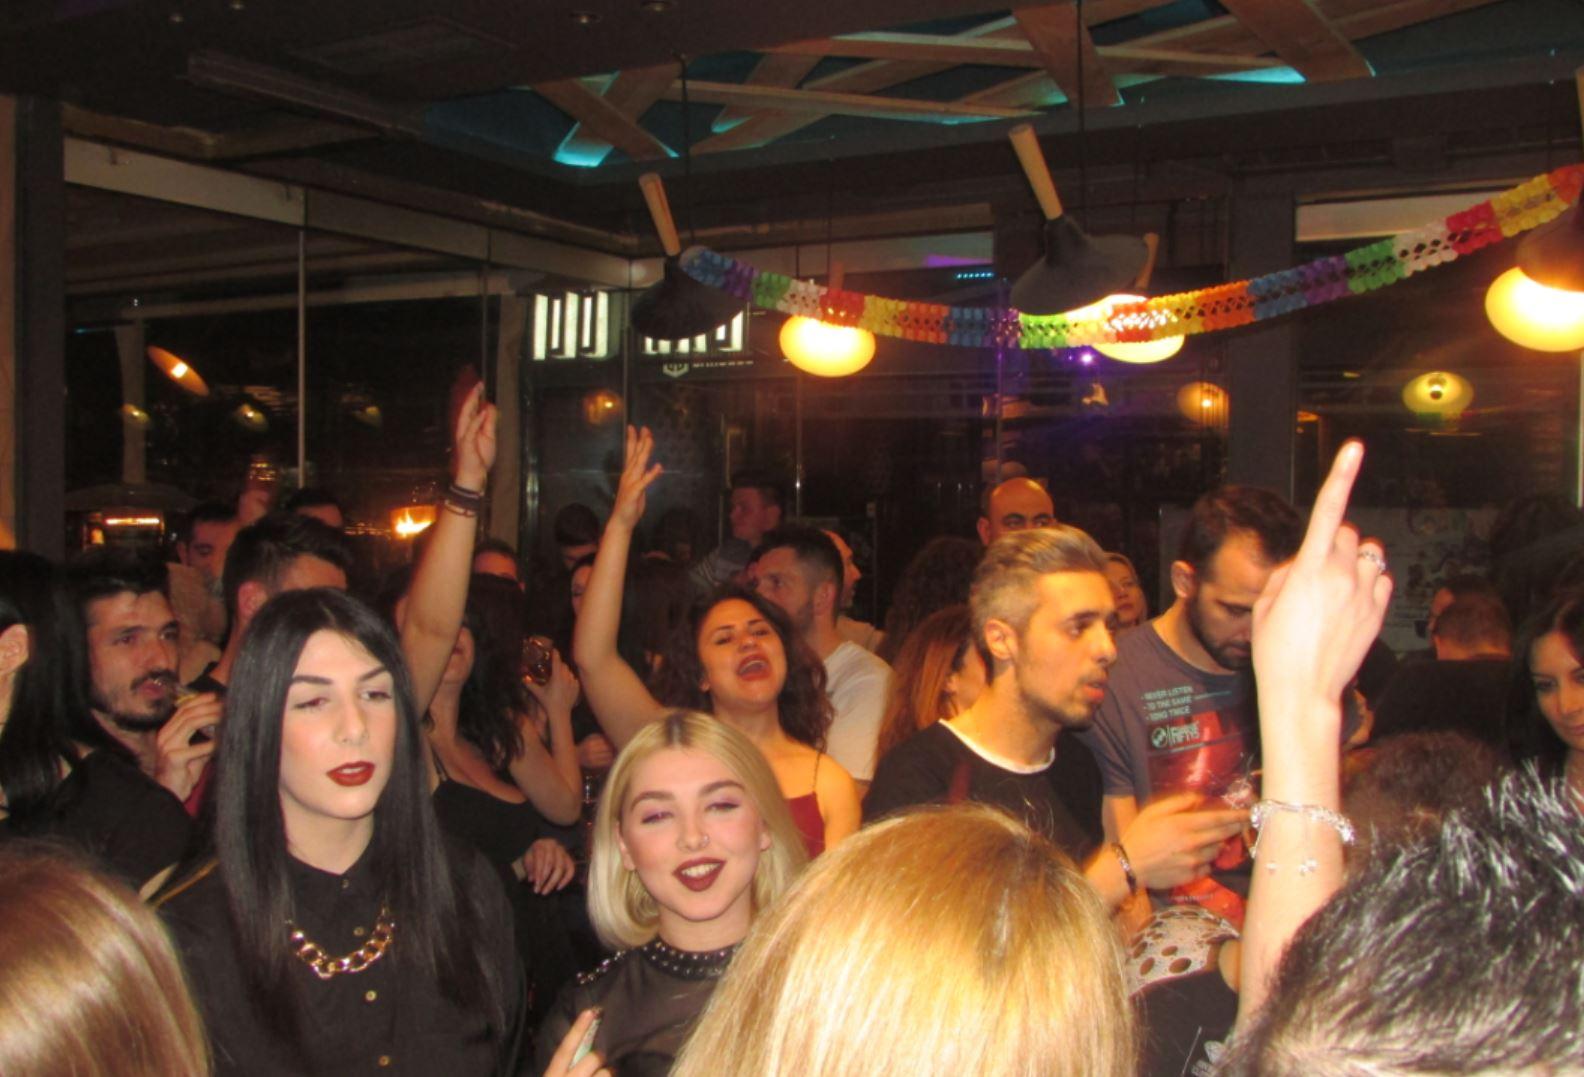 Tριαντάφυλλος …και η διασκέδαση στο Barcode, στην Κοζάνη, το βράδυ της Τετάρτης 22/2, «χτύπησε» κόκκινο!